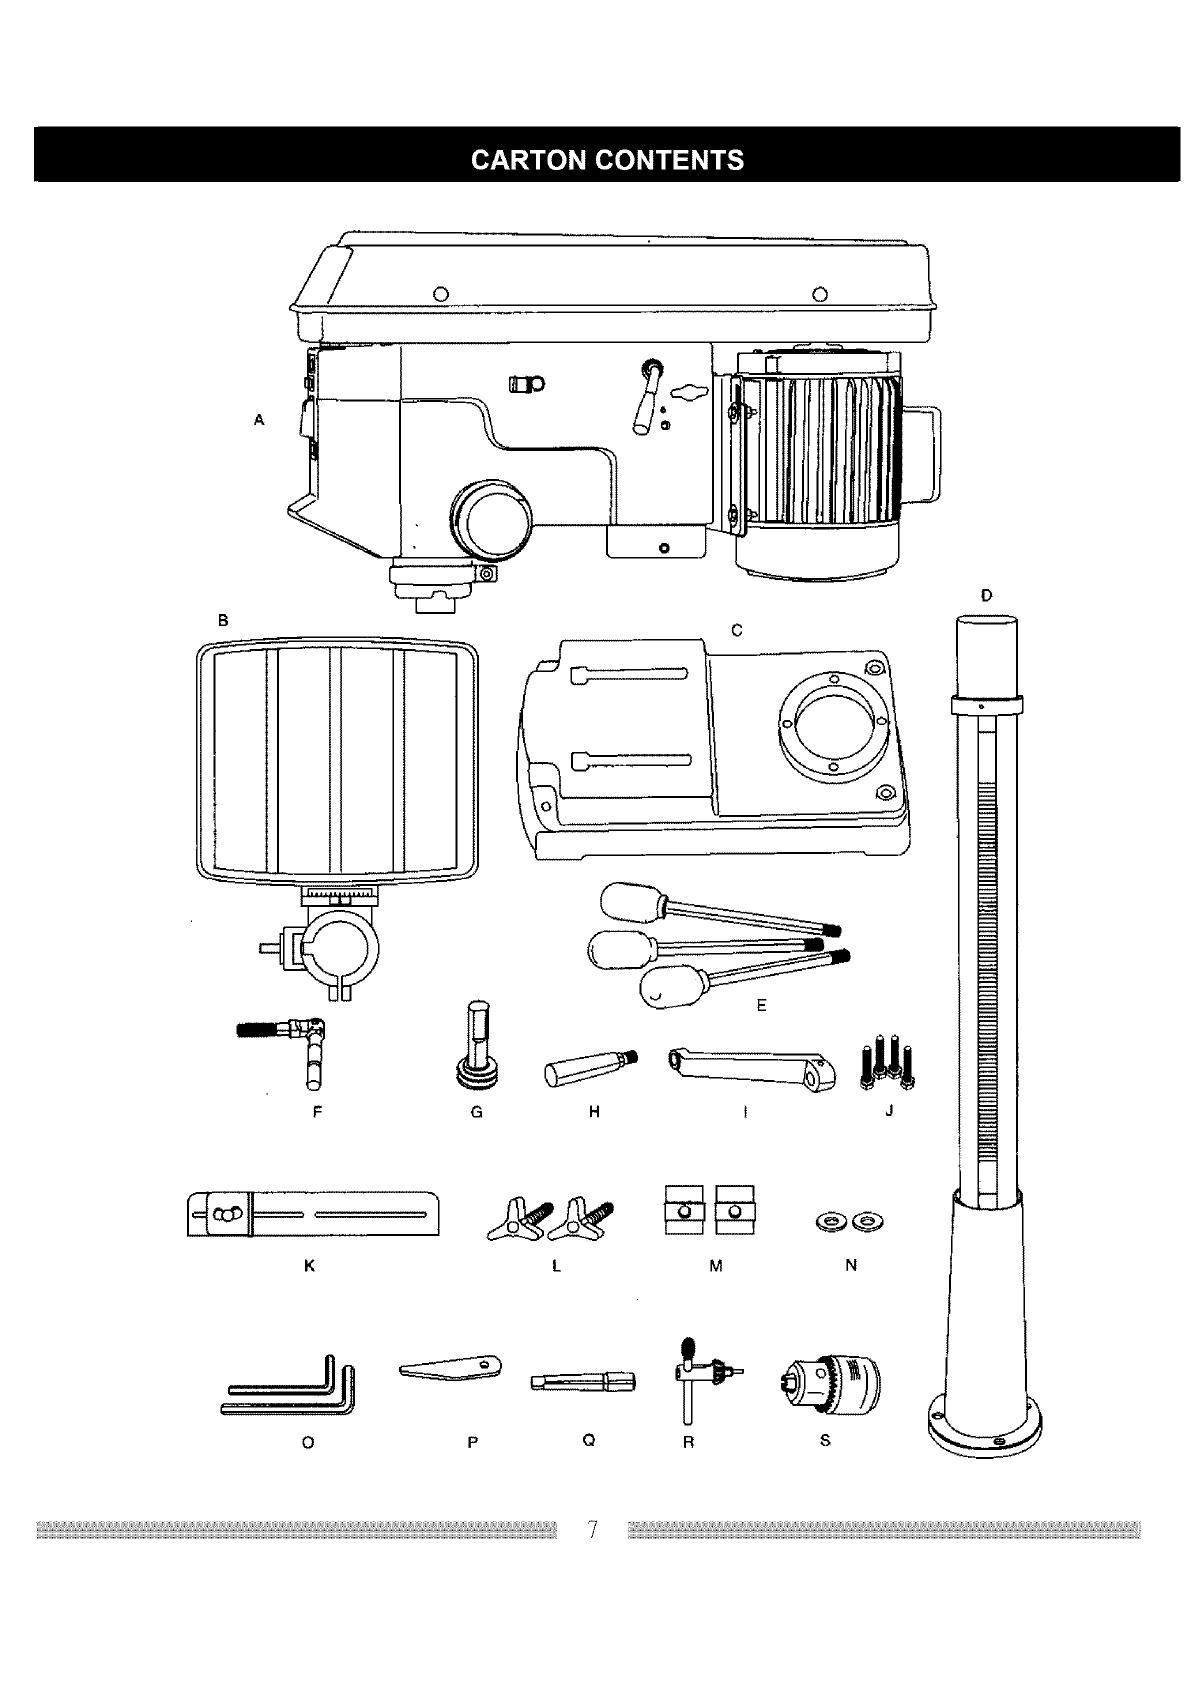 Craftsman 137229200 User Manual 20 DRILL PRESS Manuals And